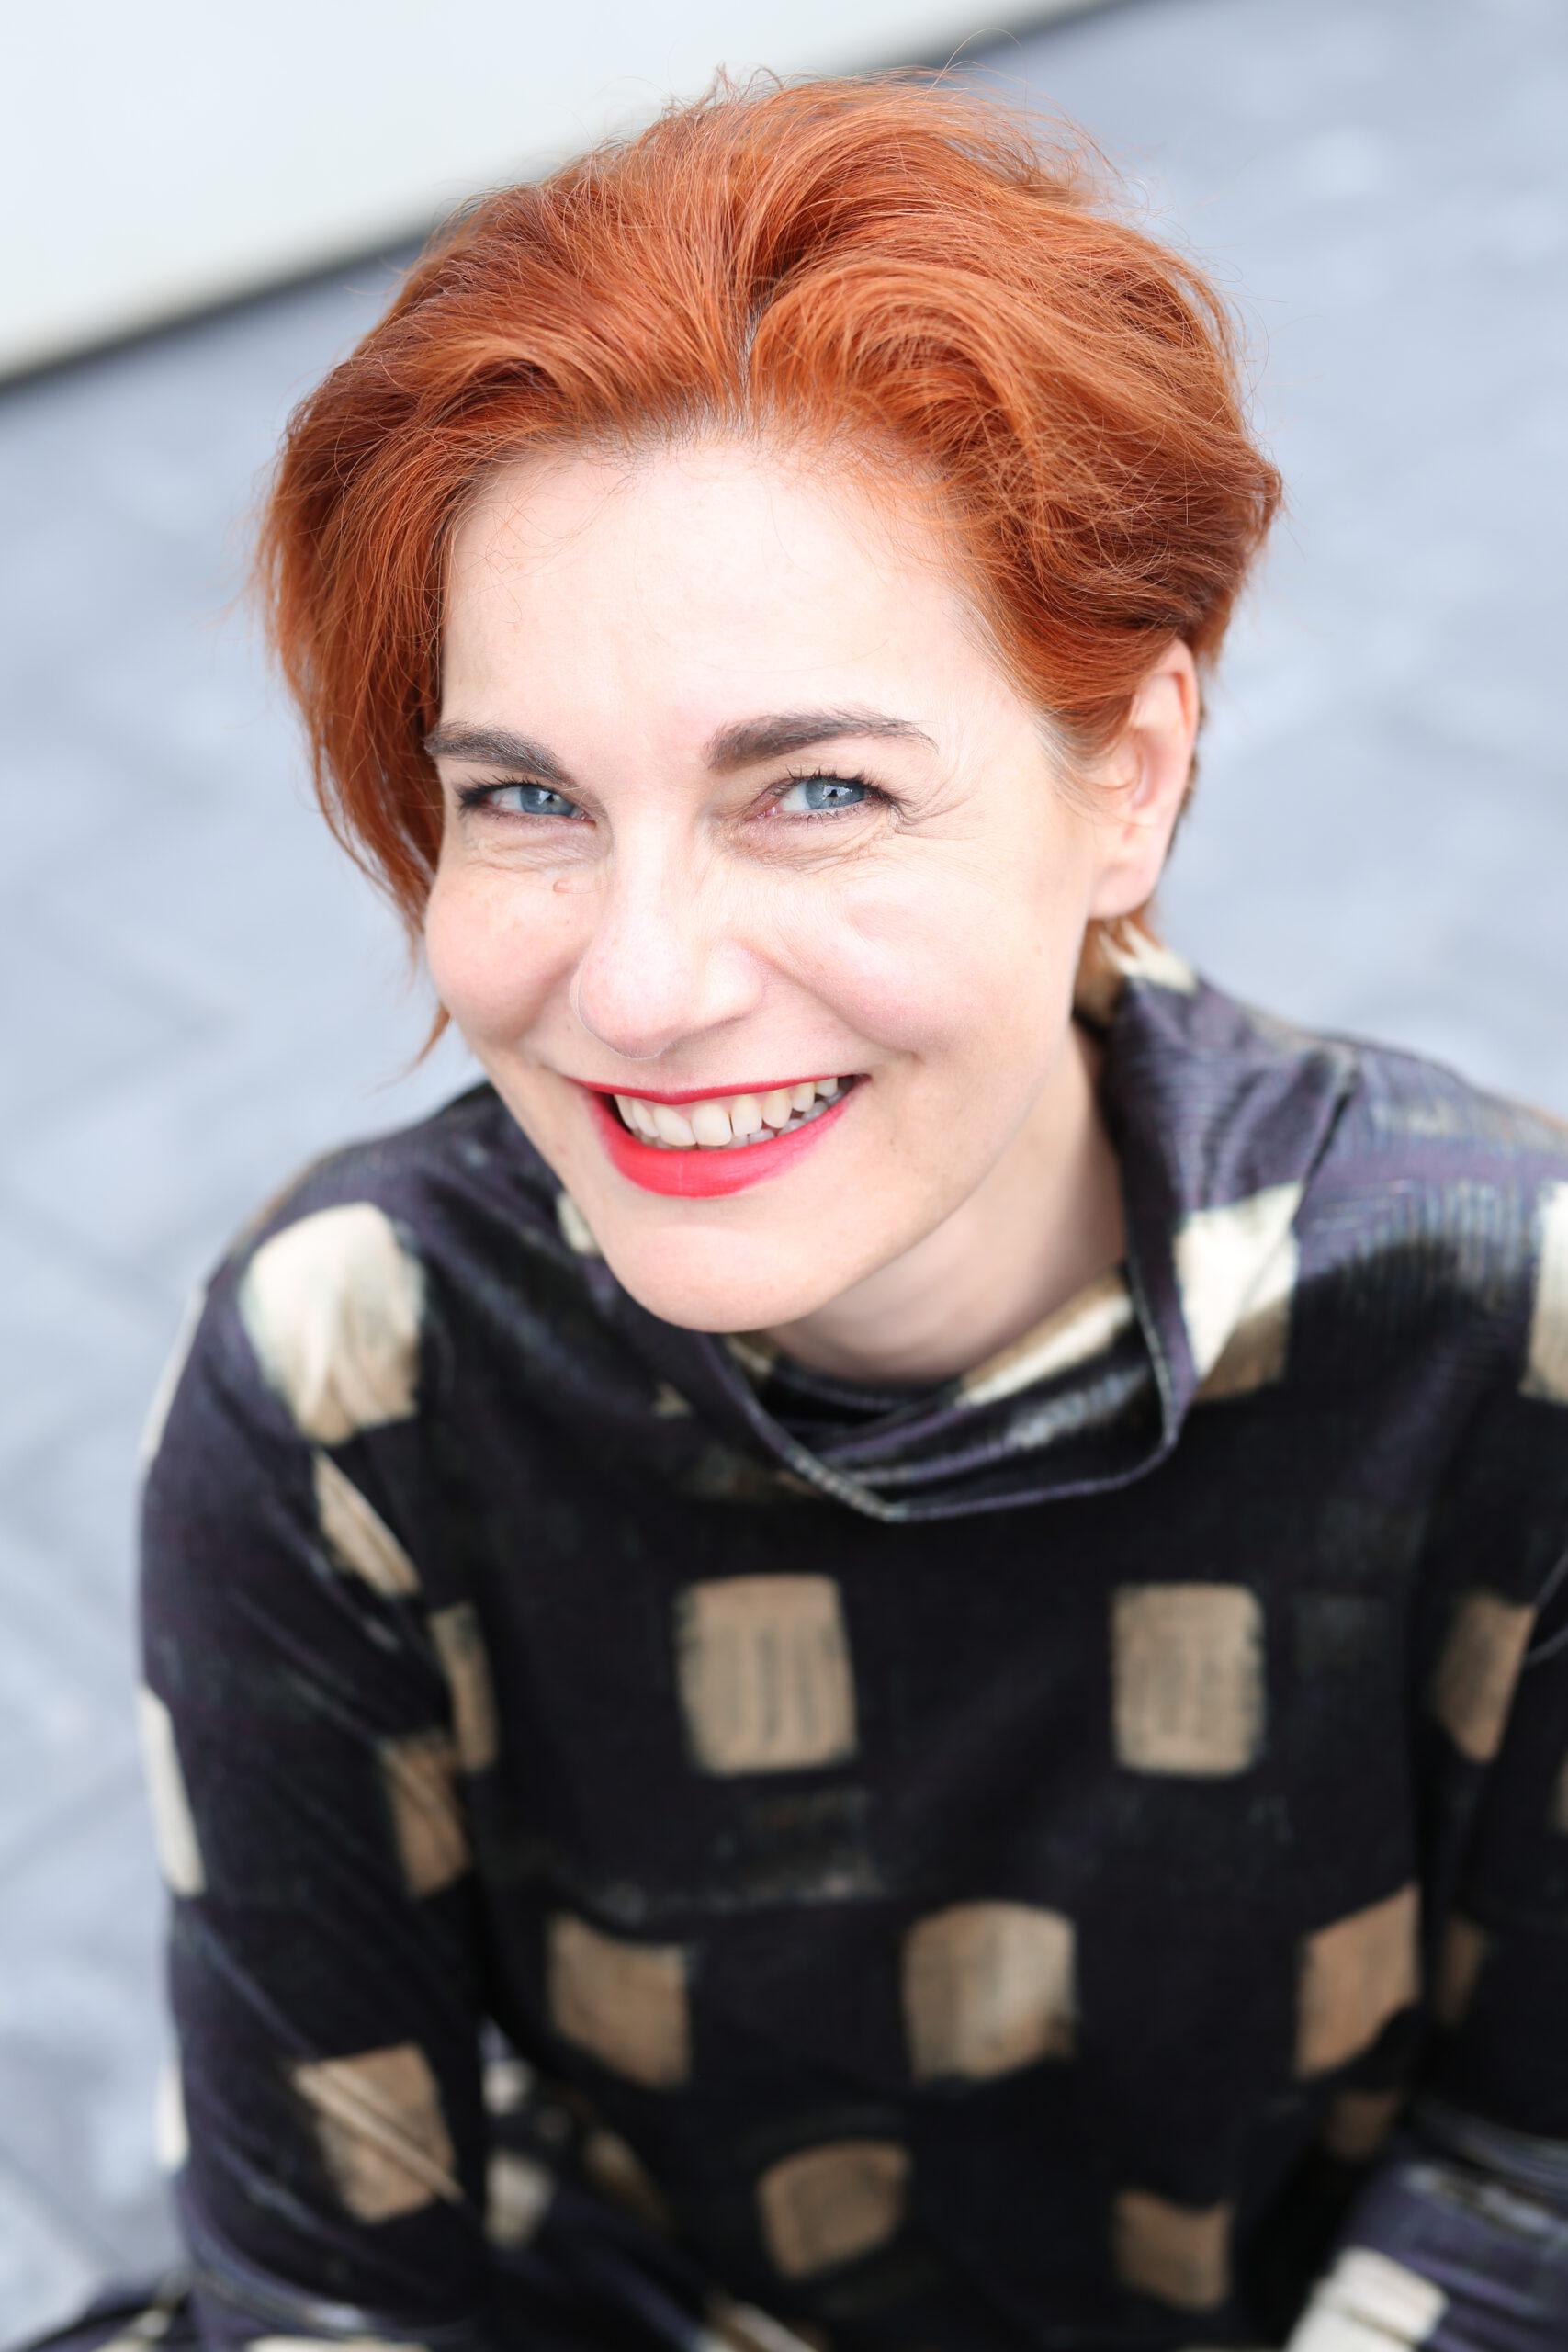 Cornelia Haslbauer